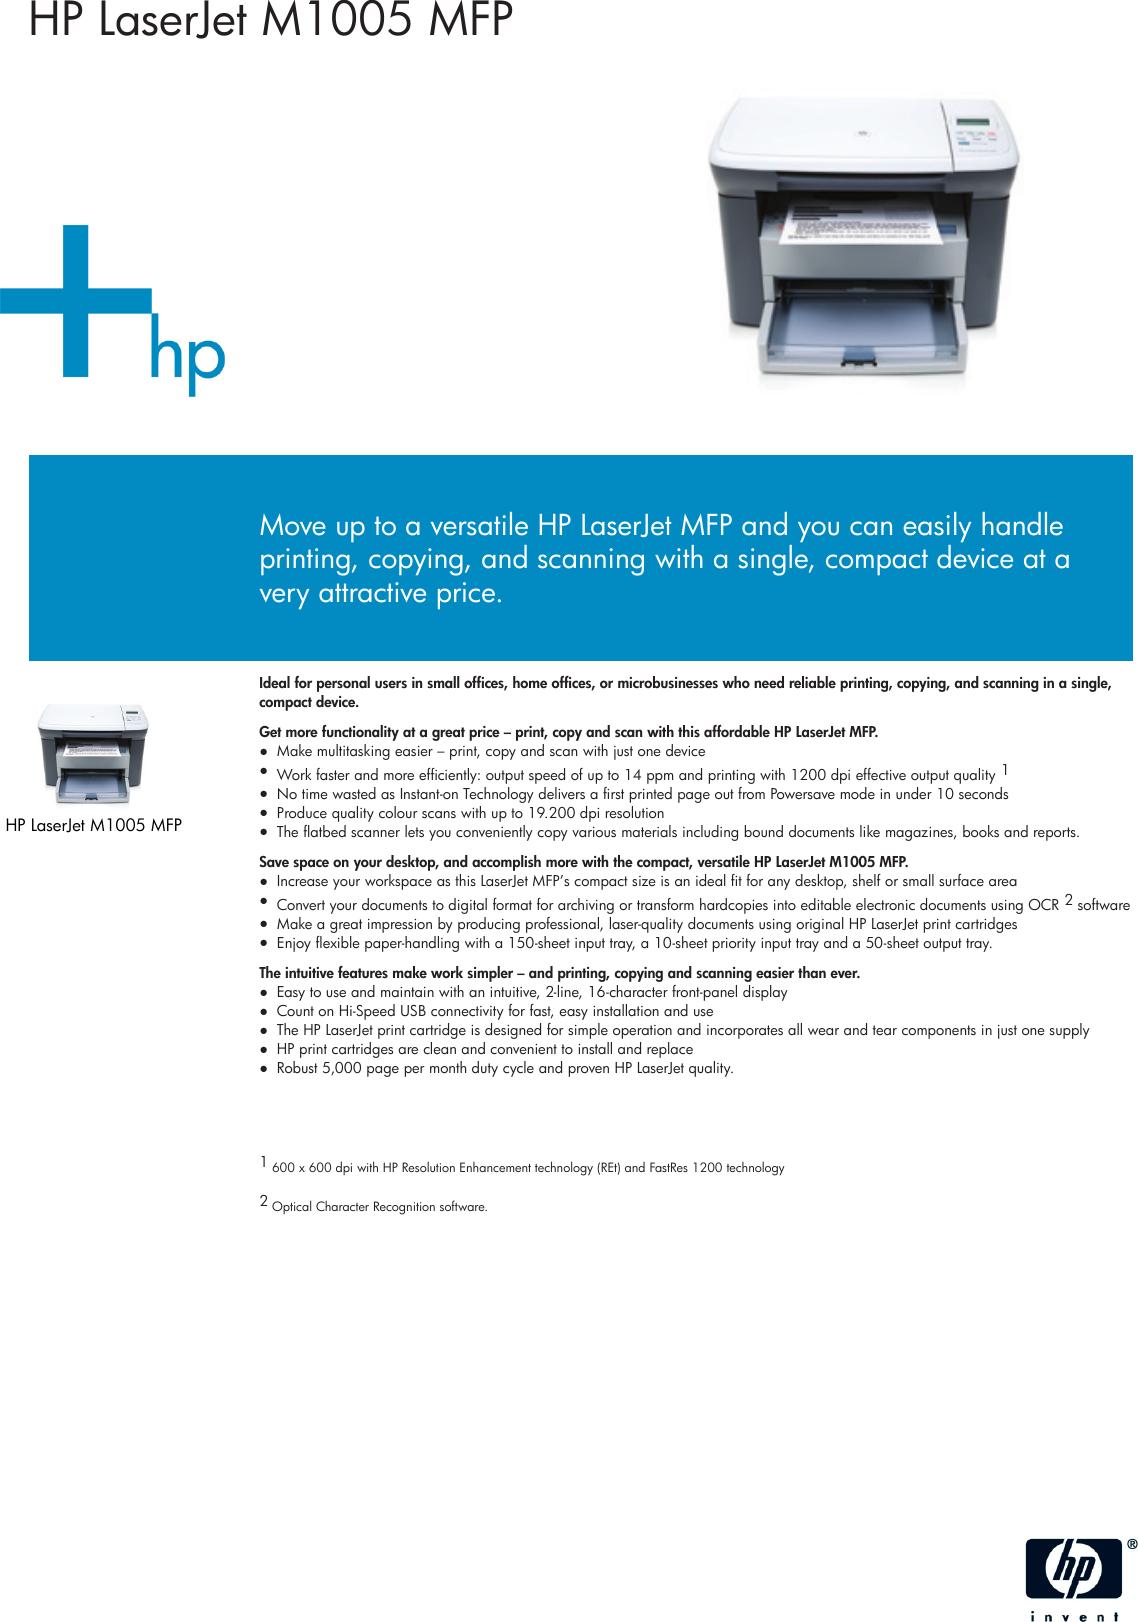 hp laserjet m1005 mfp user manual pdf